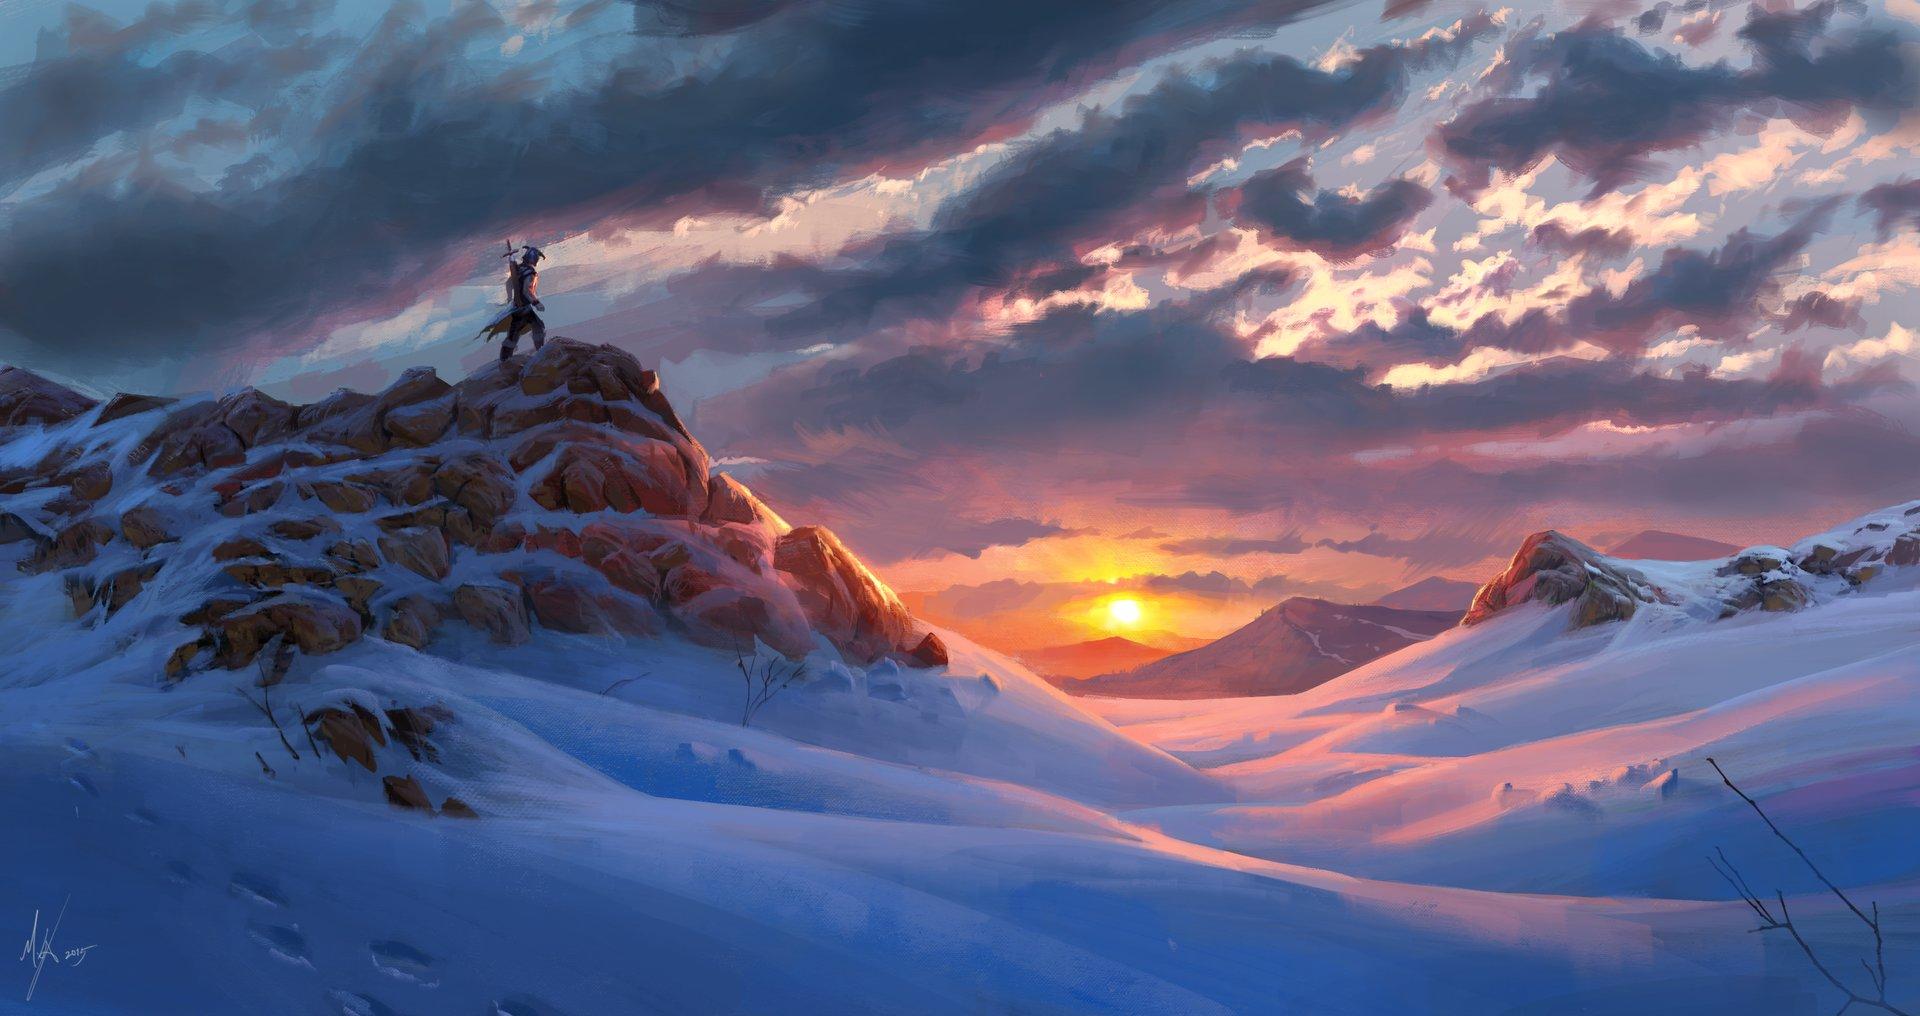 Michal kus snowy speedy8